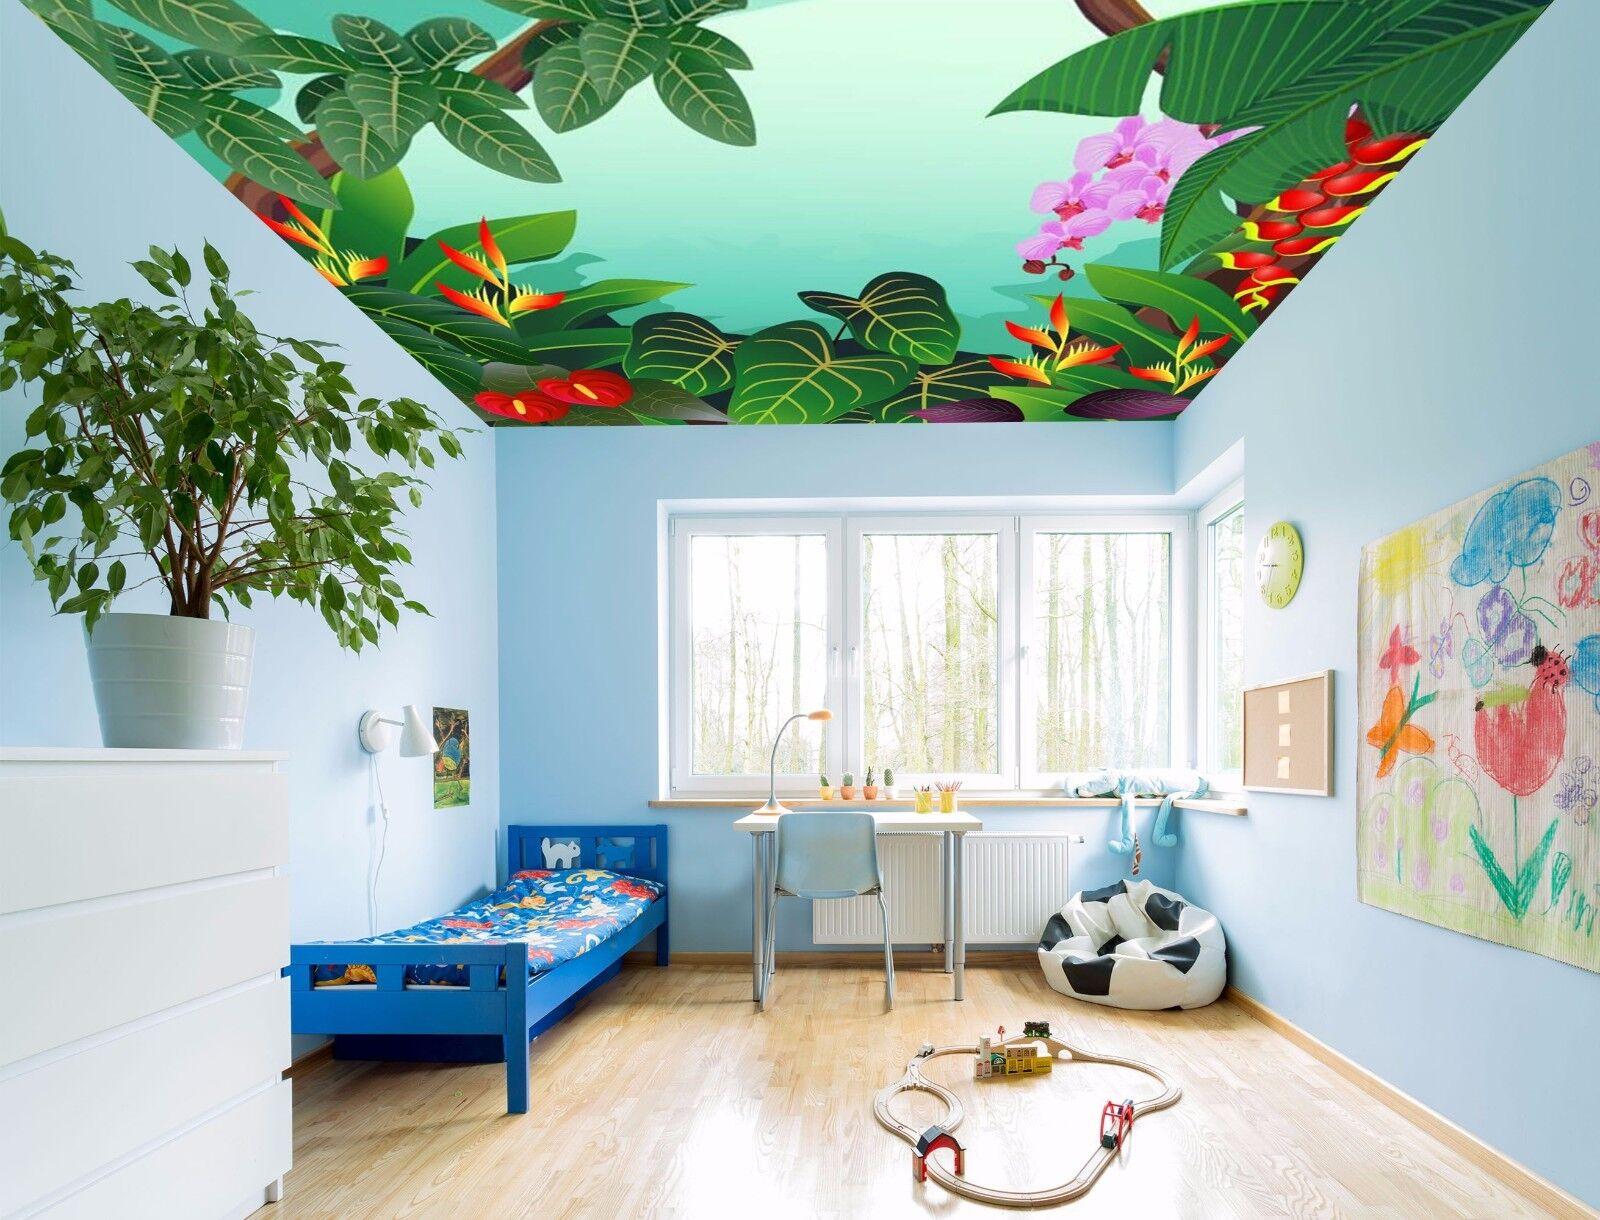 3D Cute Leaves 85 Ceiling WallPaper Murals Wall Print Decal Deco AJ WALLPAPER GB